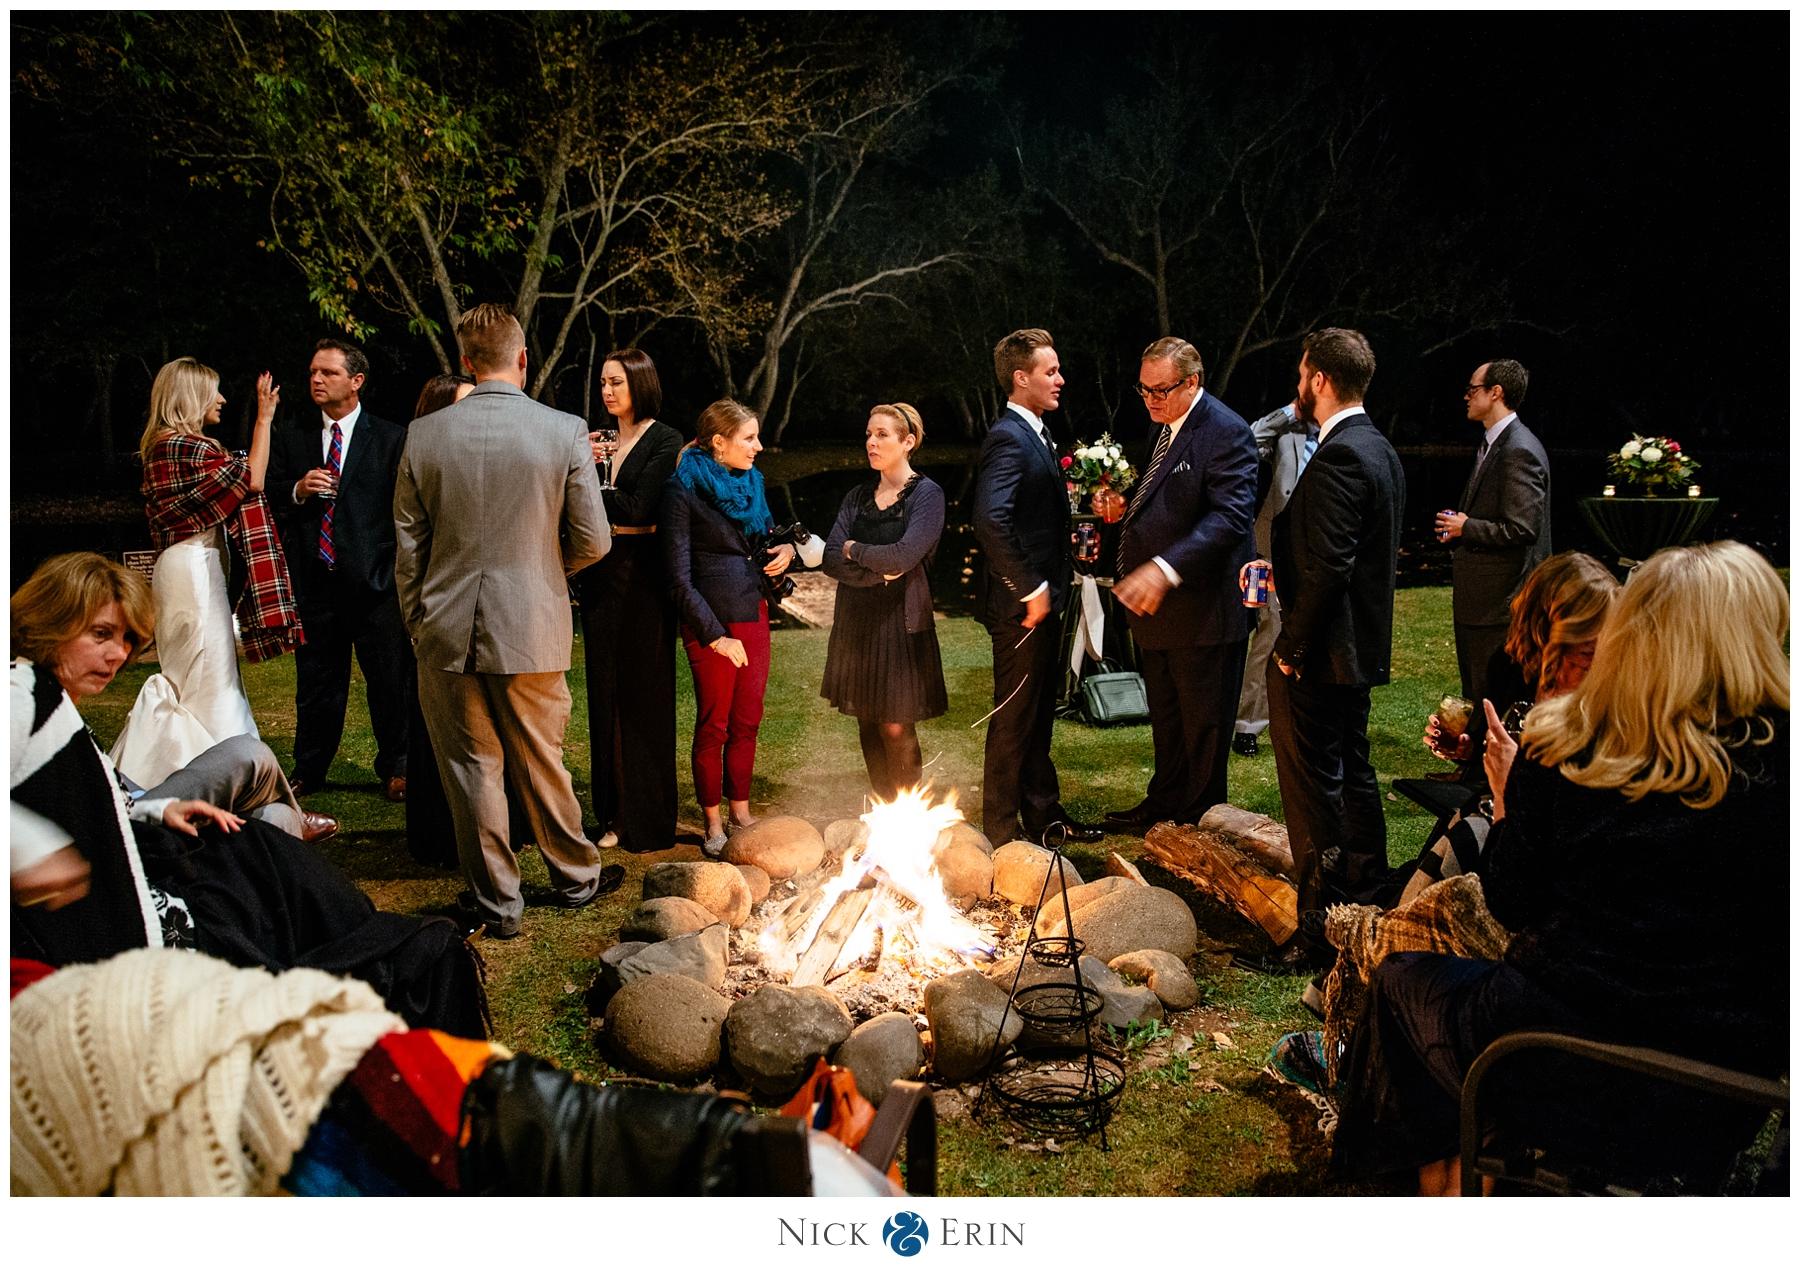 Donner_Photography_Sedona Arizona Wedding_Alissa and Tom_0076